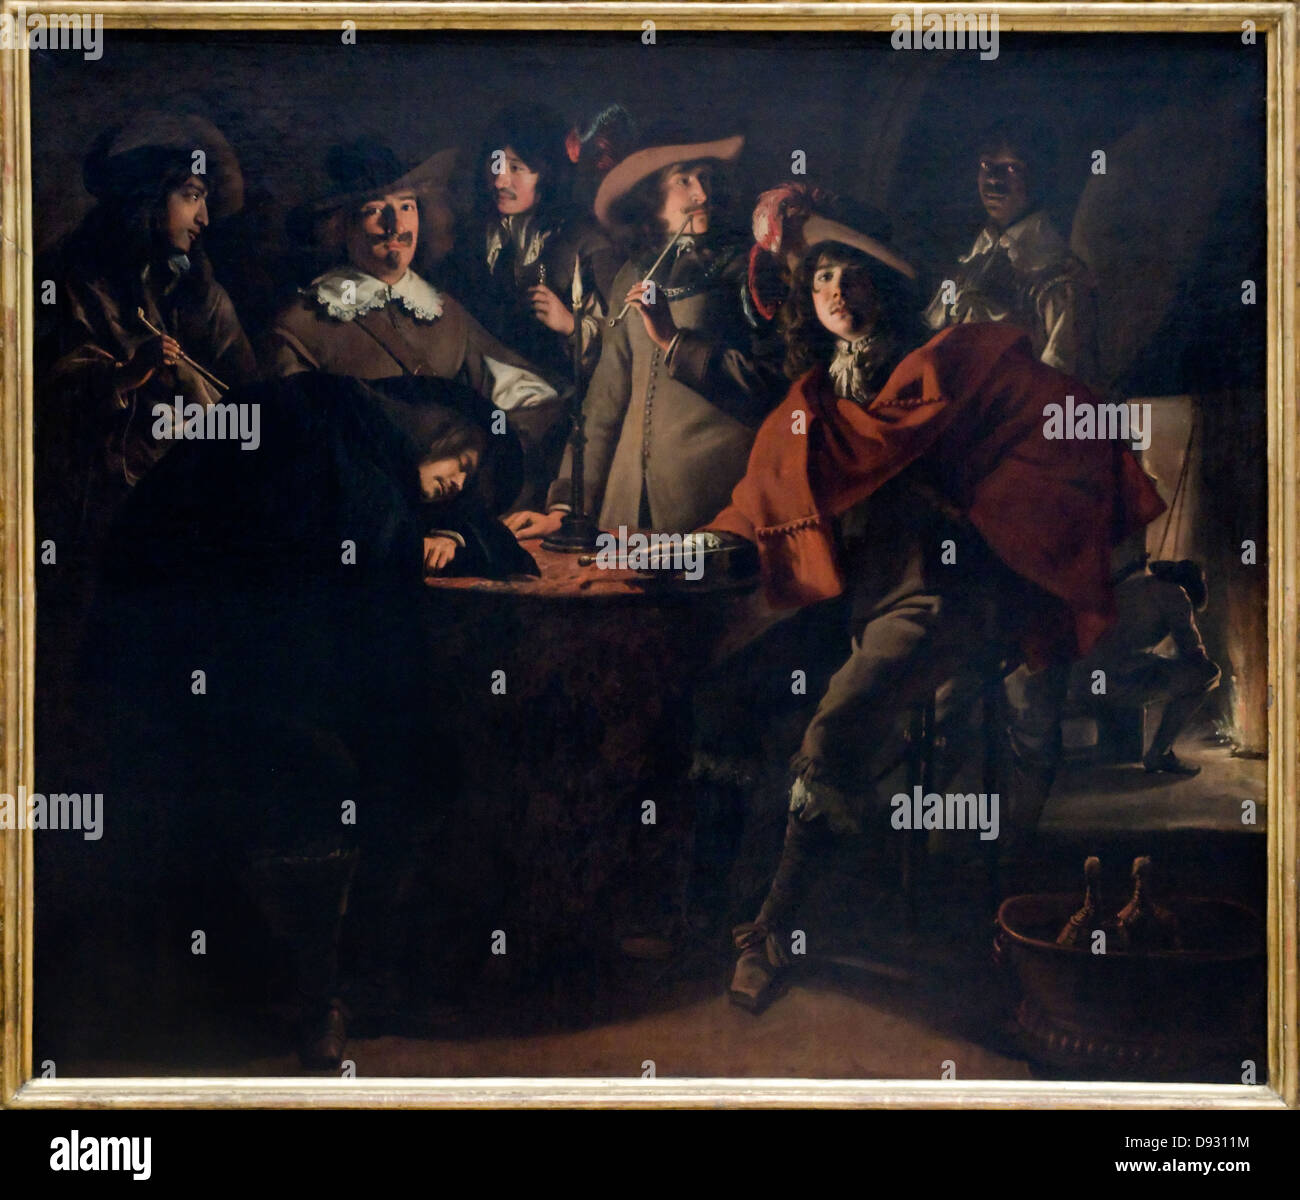 Louis (or Antoine) Le Nain La tabagie ou le corps de garde - smoking 1643 French school - Stock Image